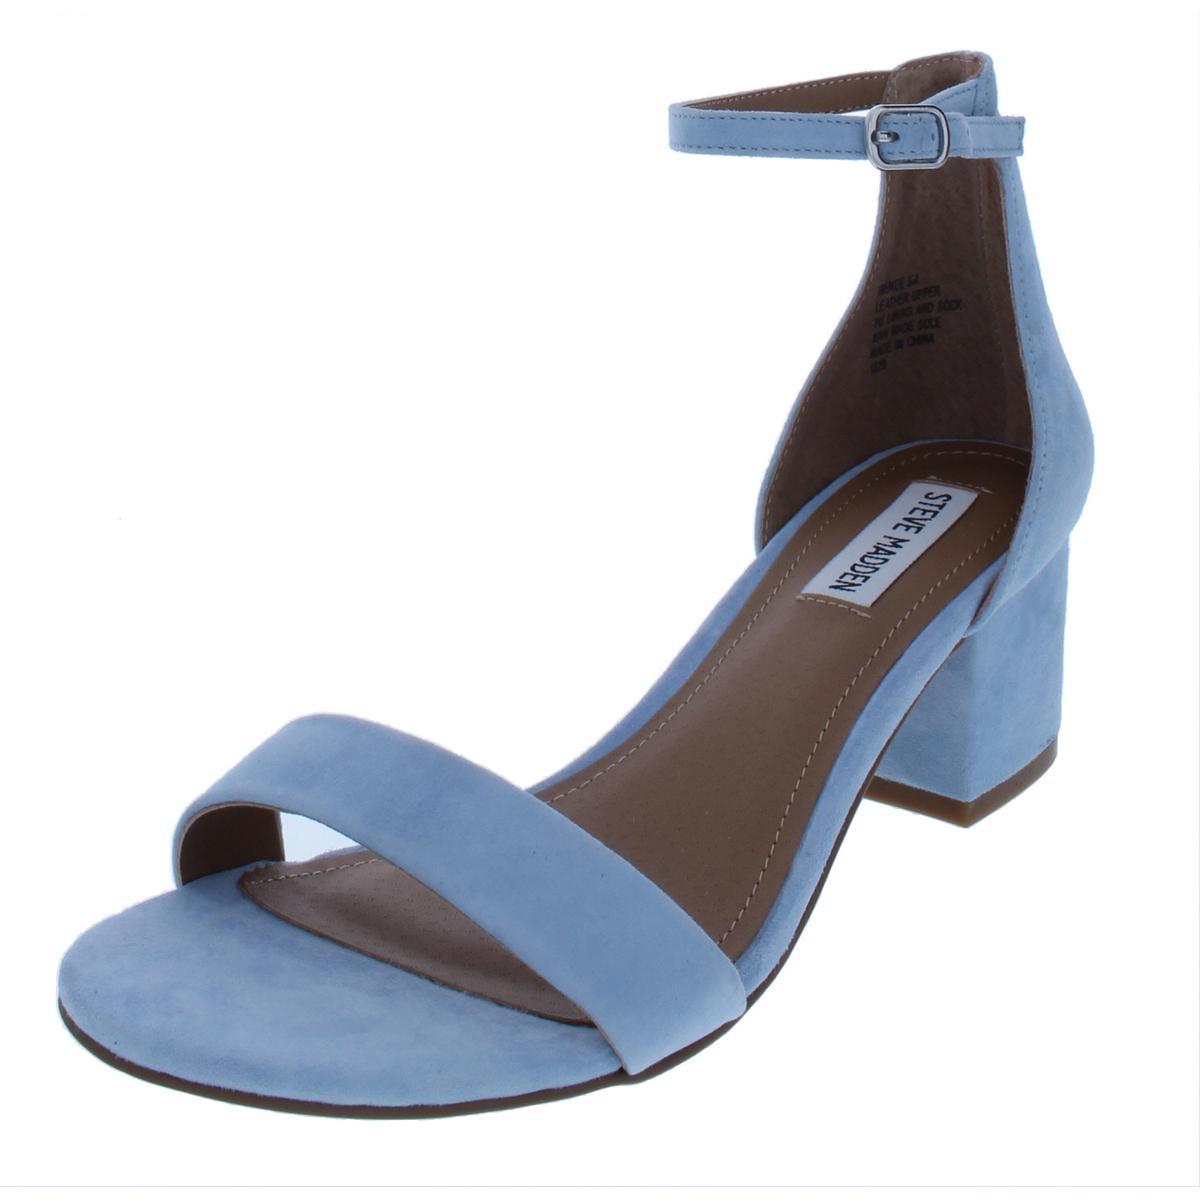 adb5b6f317e Details about Steve Madden Womens Irenee Blue Dress Sandals Heels 6 Medium  (B